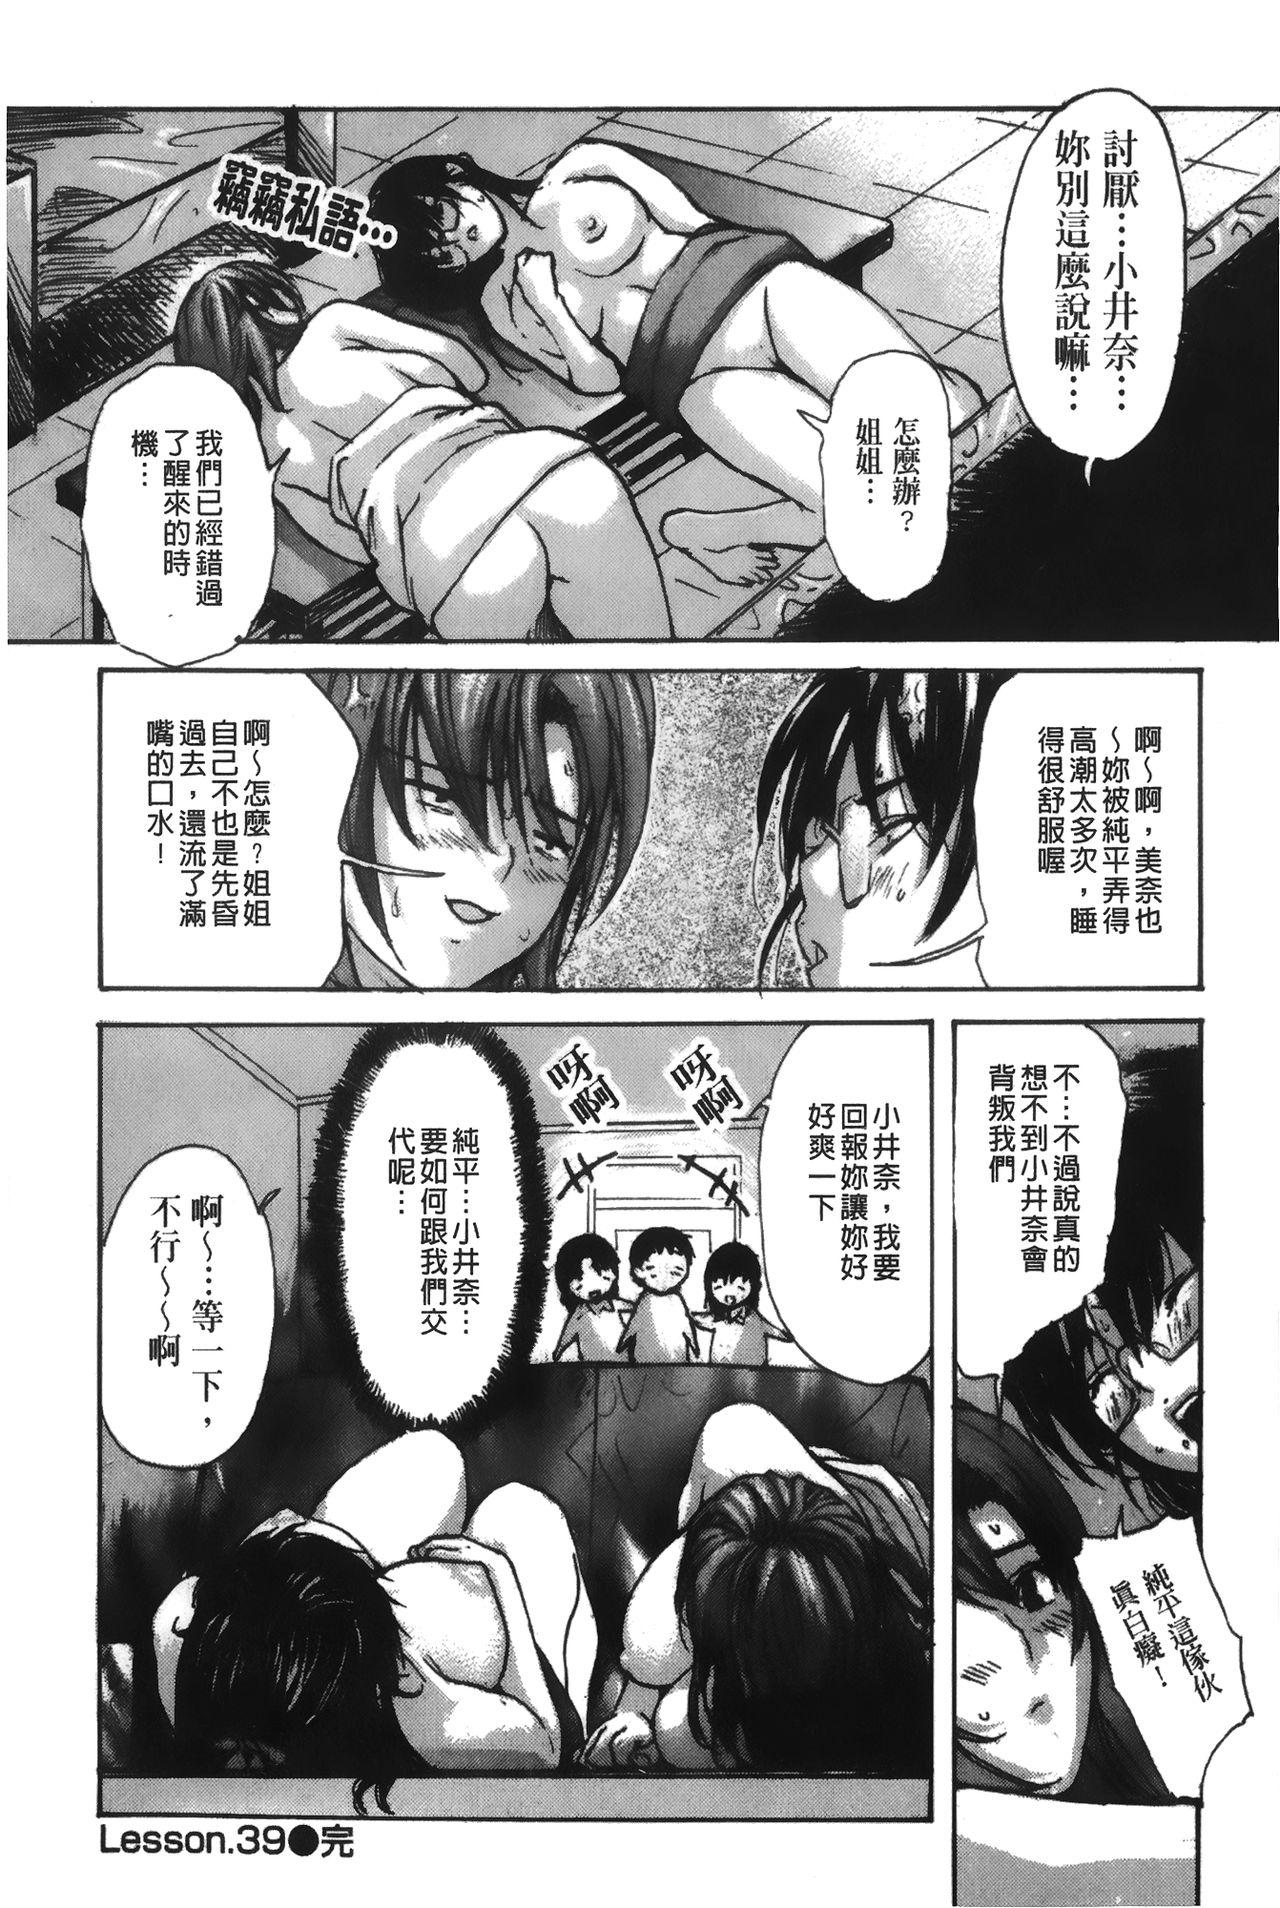 Tonari no Minano Sensei 4 | 隔壁的美奈乃老師 4 169